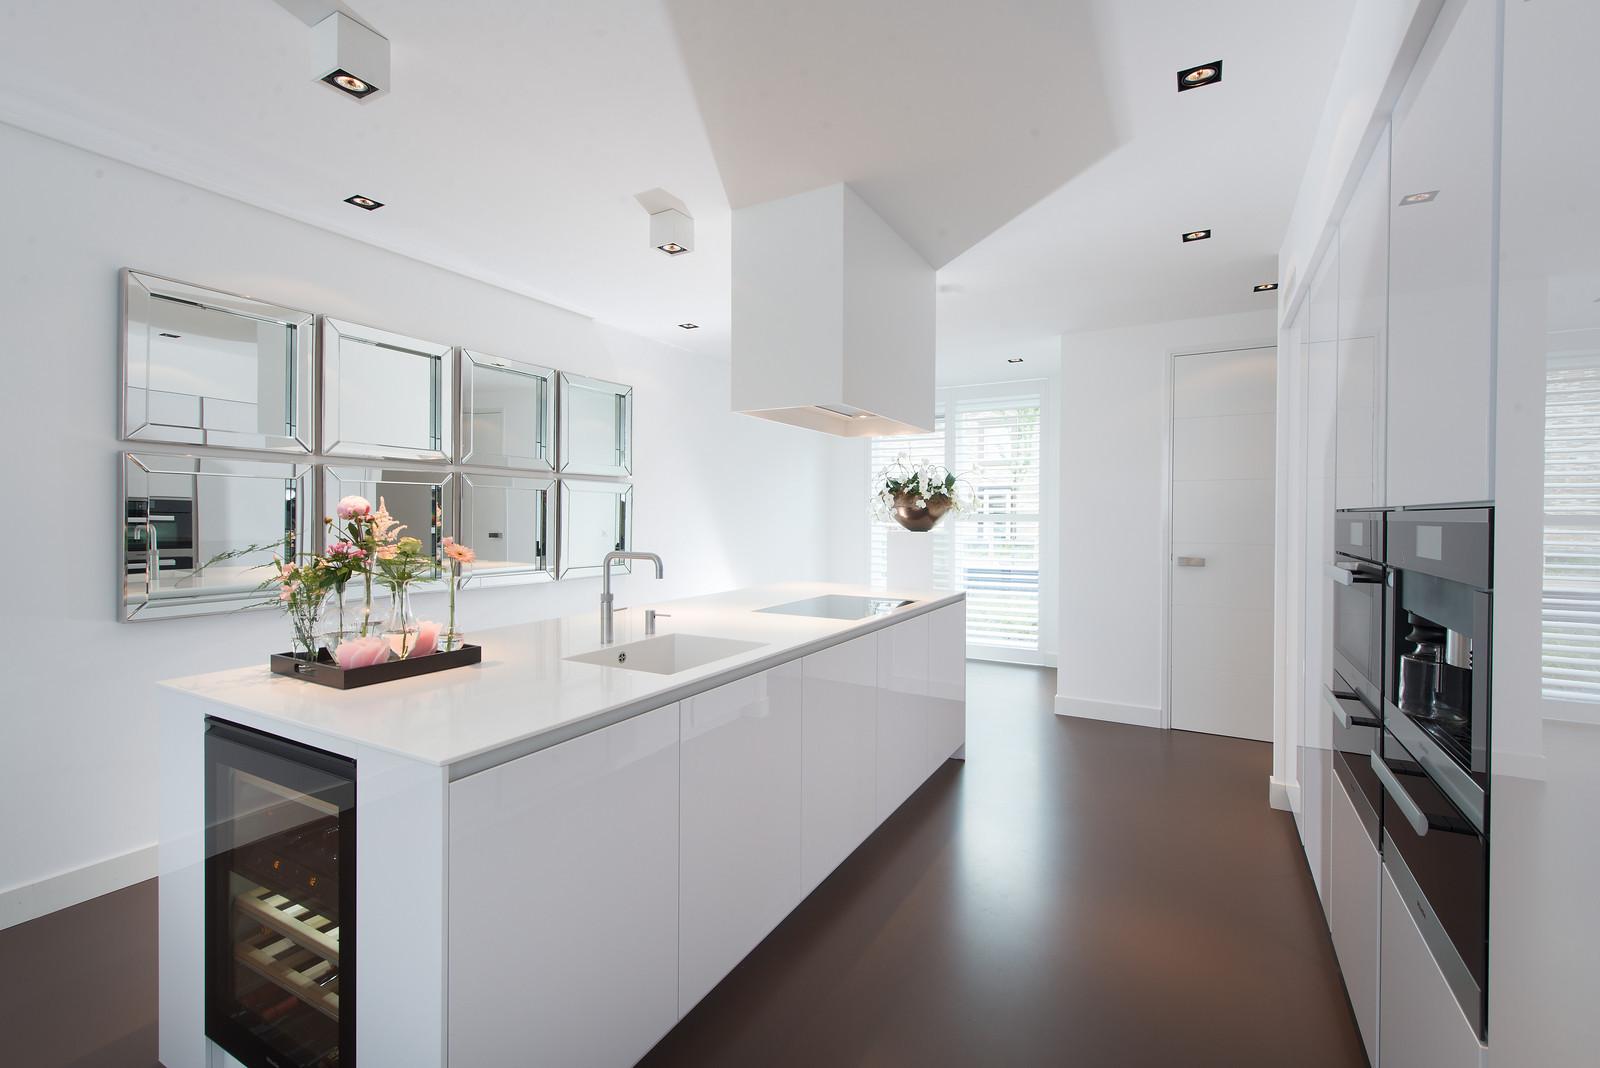 Witte hoogglans keuken met groot kookeiland - Snaidero Way via Tieleman Keukens